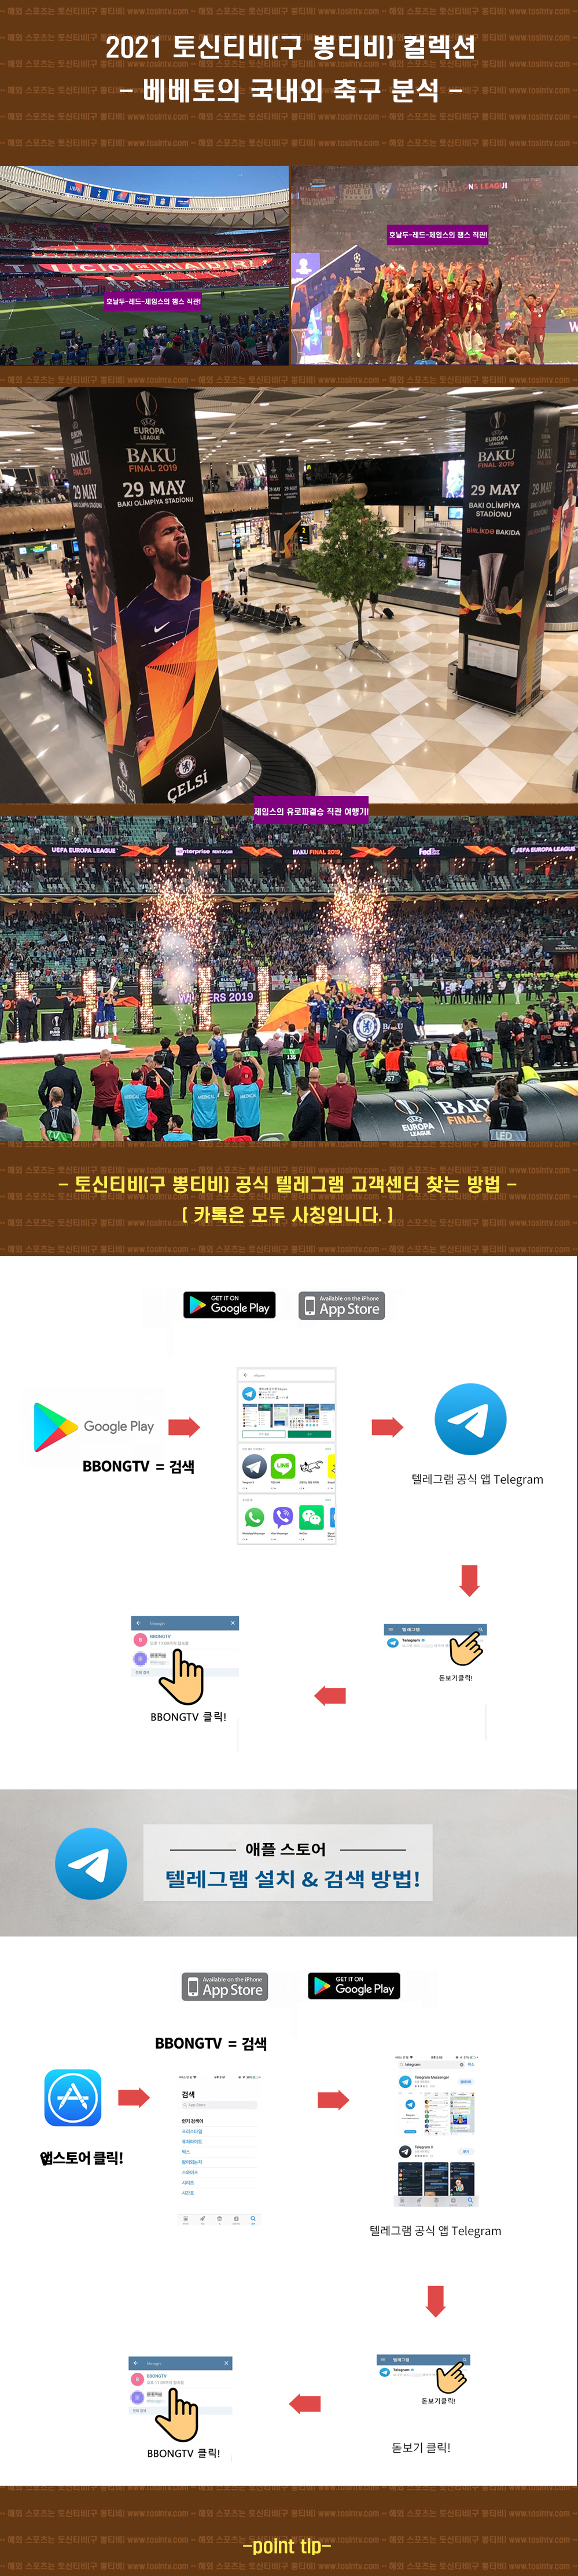 Aaㄱ베베토-축구-분석 (1).jpg